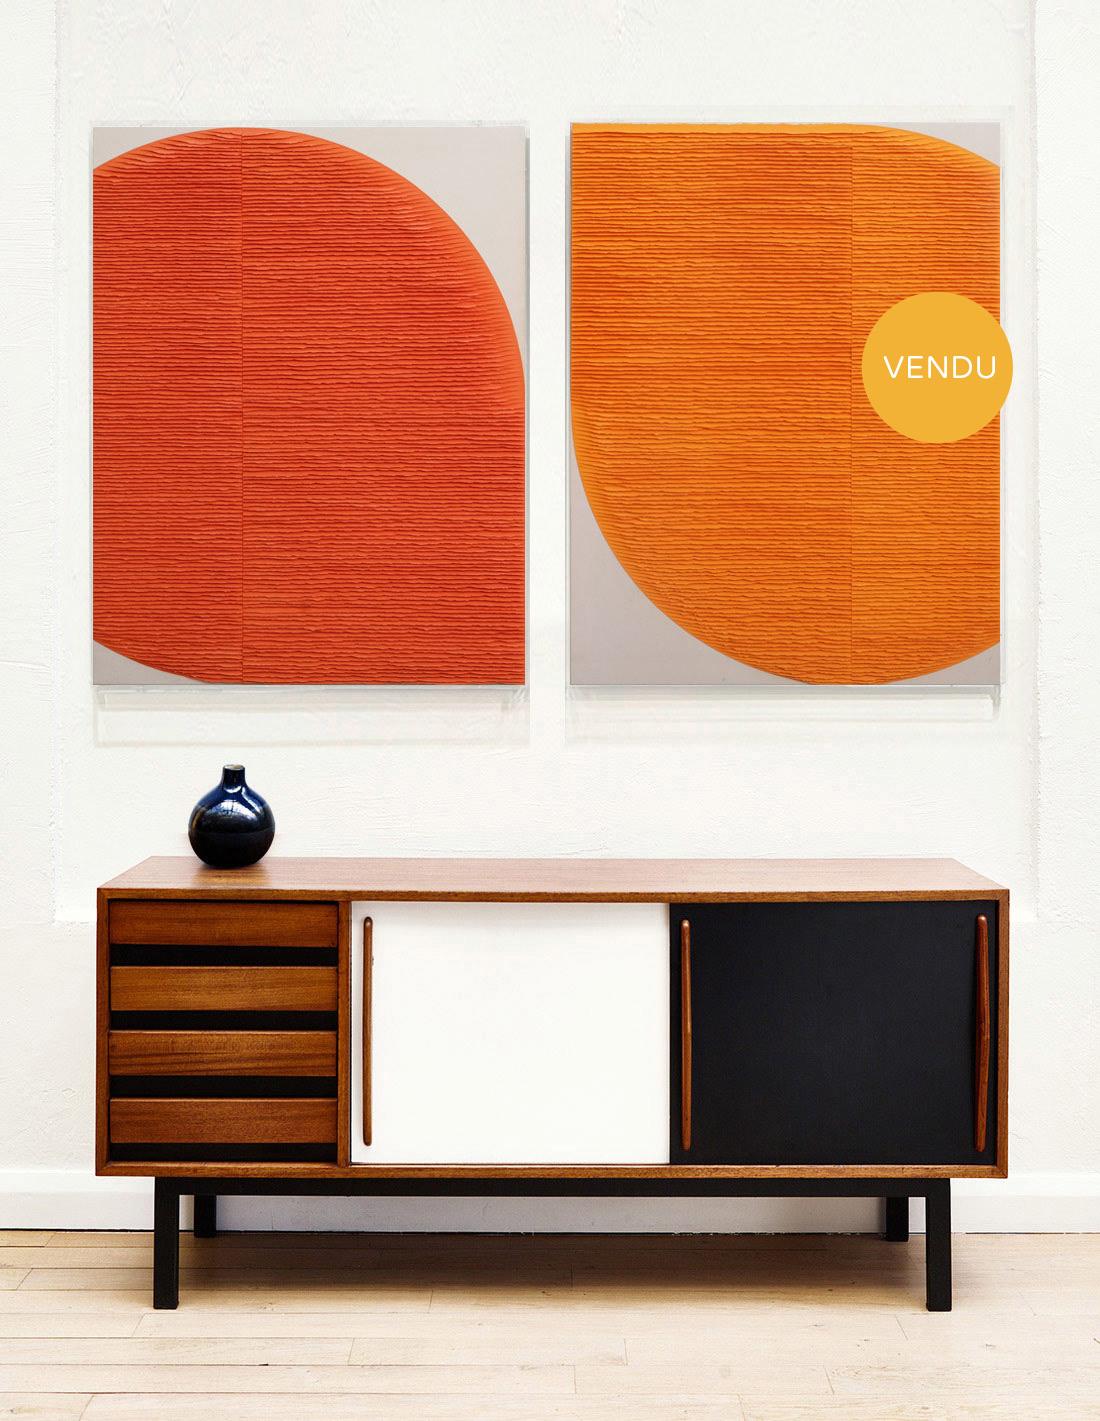 Deux-formes-oranges-insitu-vendu